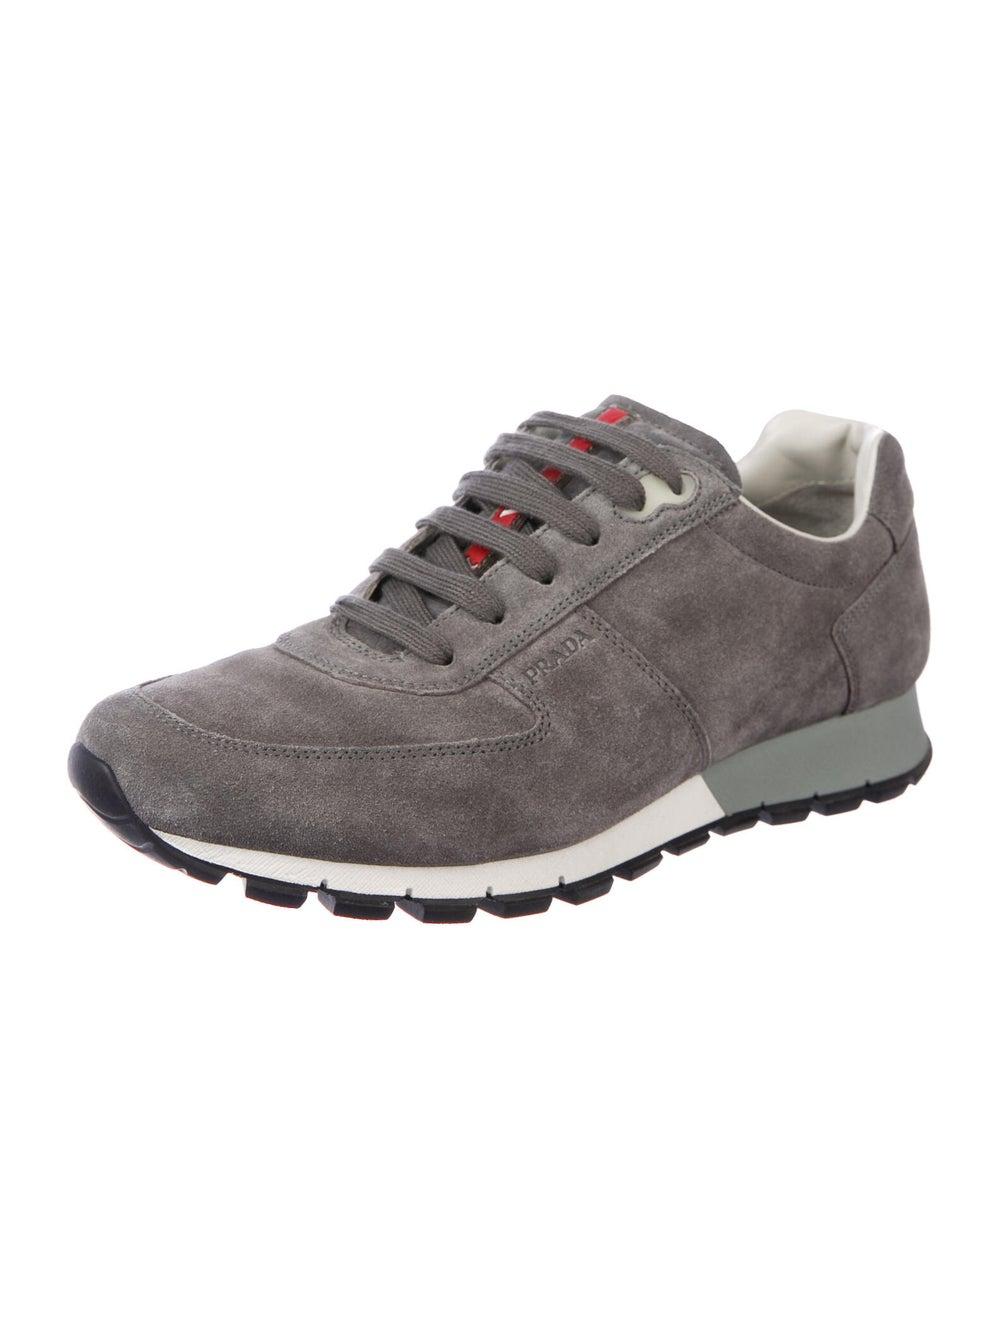 Prada Sport Suede Sneakers Grey - image 2